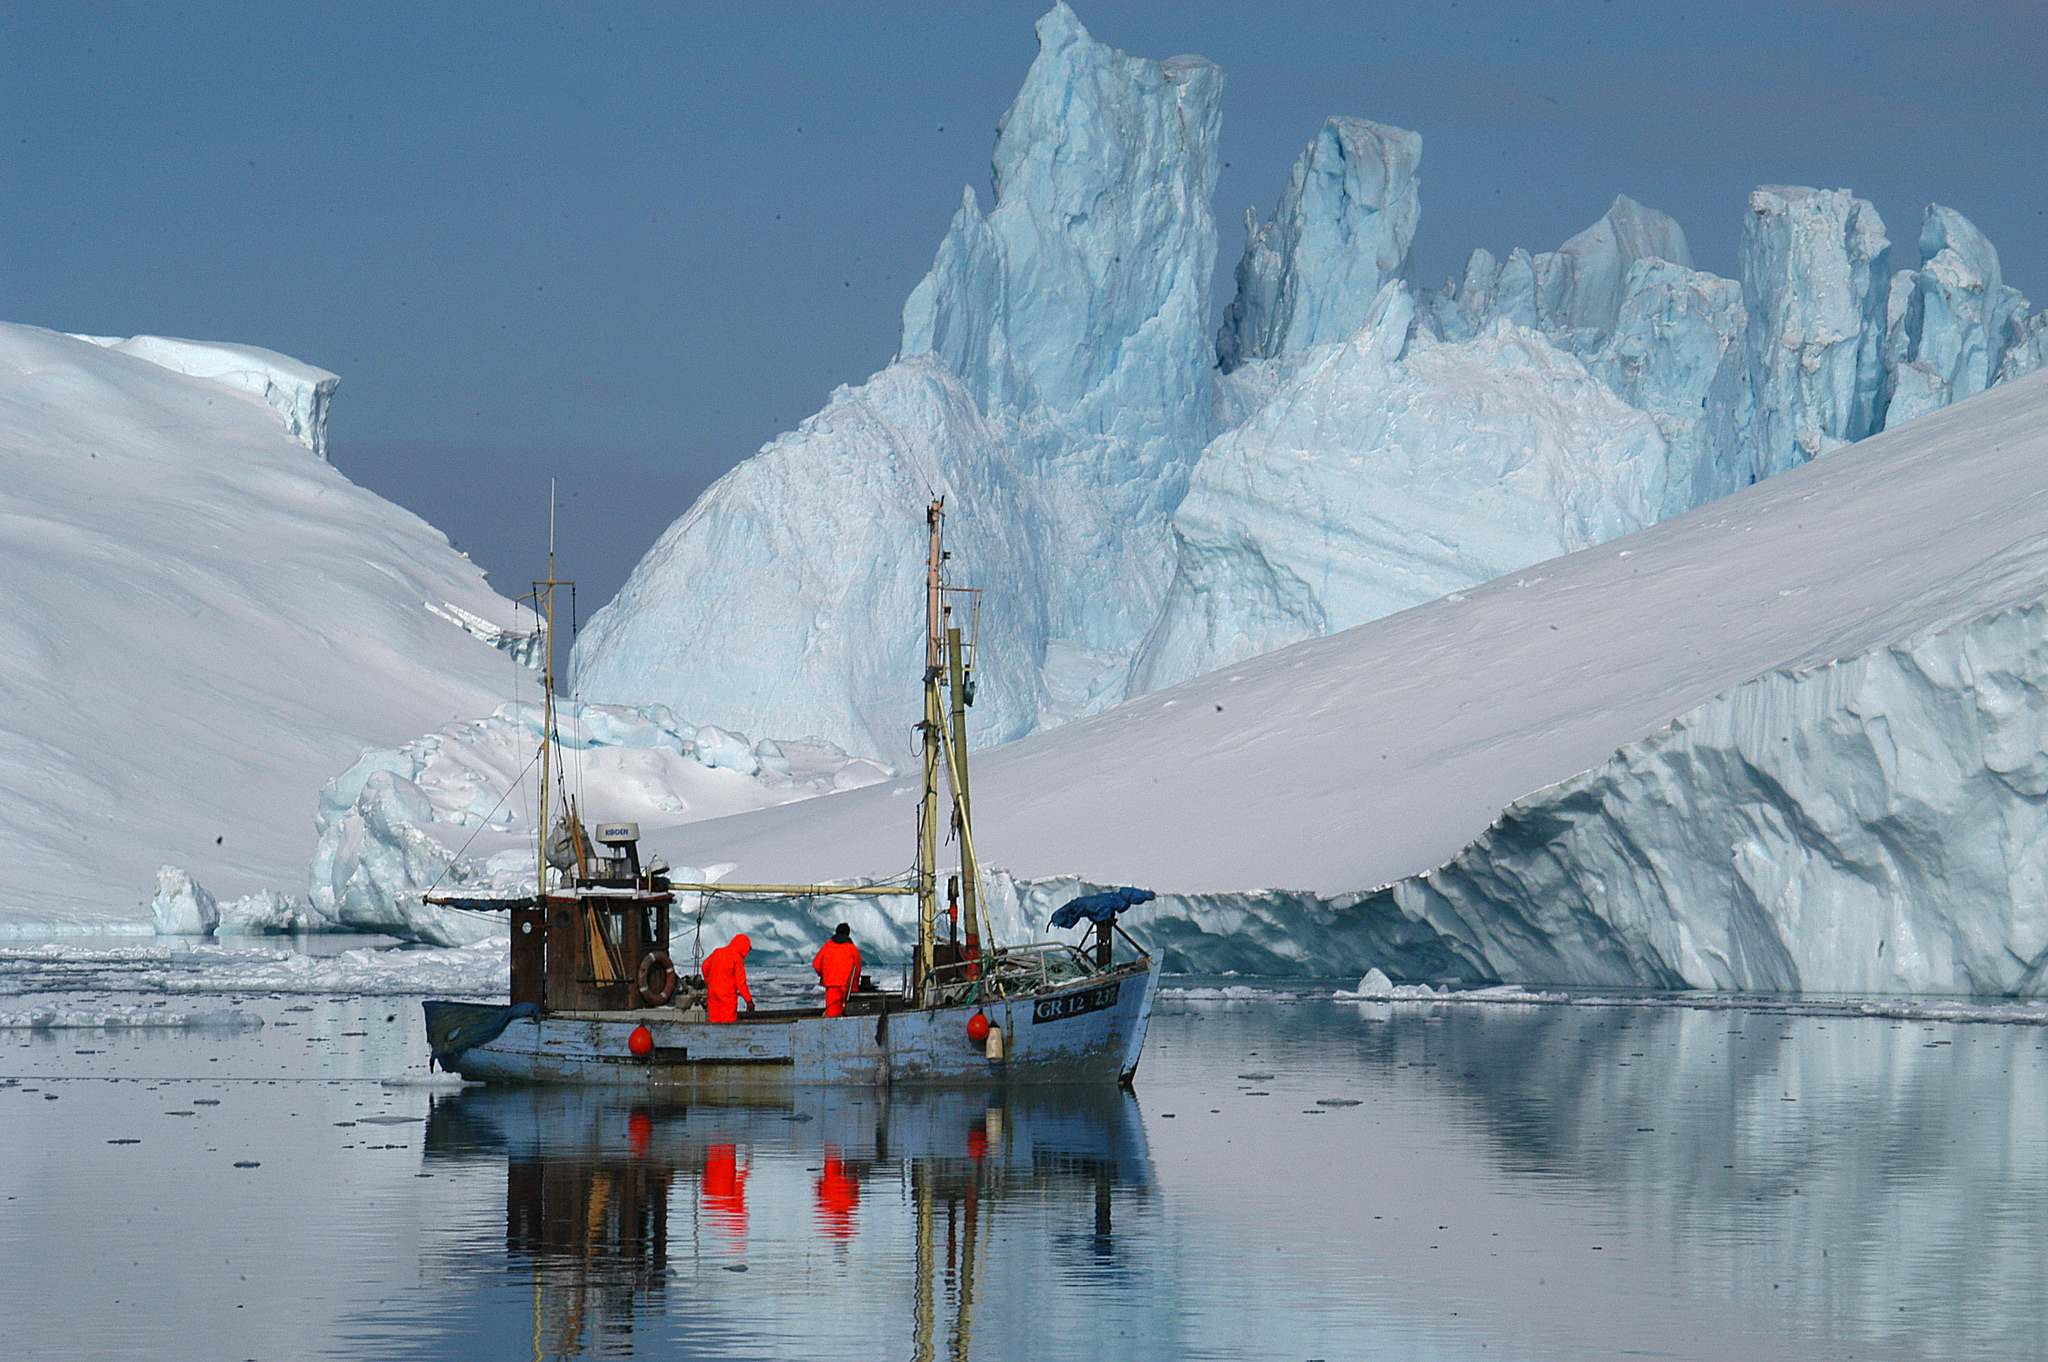 icefjord ilulissat3 The icefjord in Ilulissat, Greenland